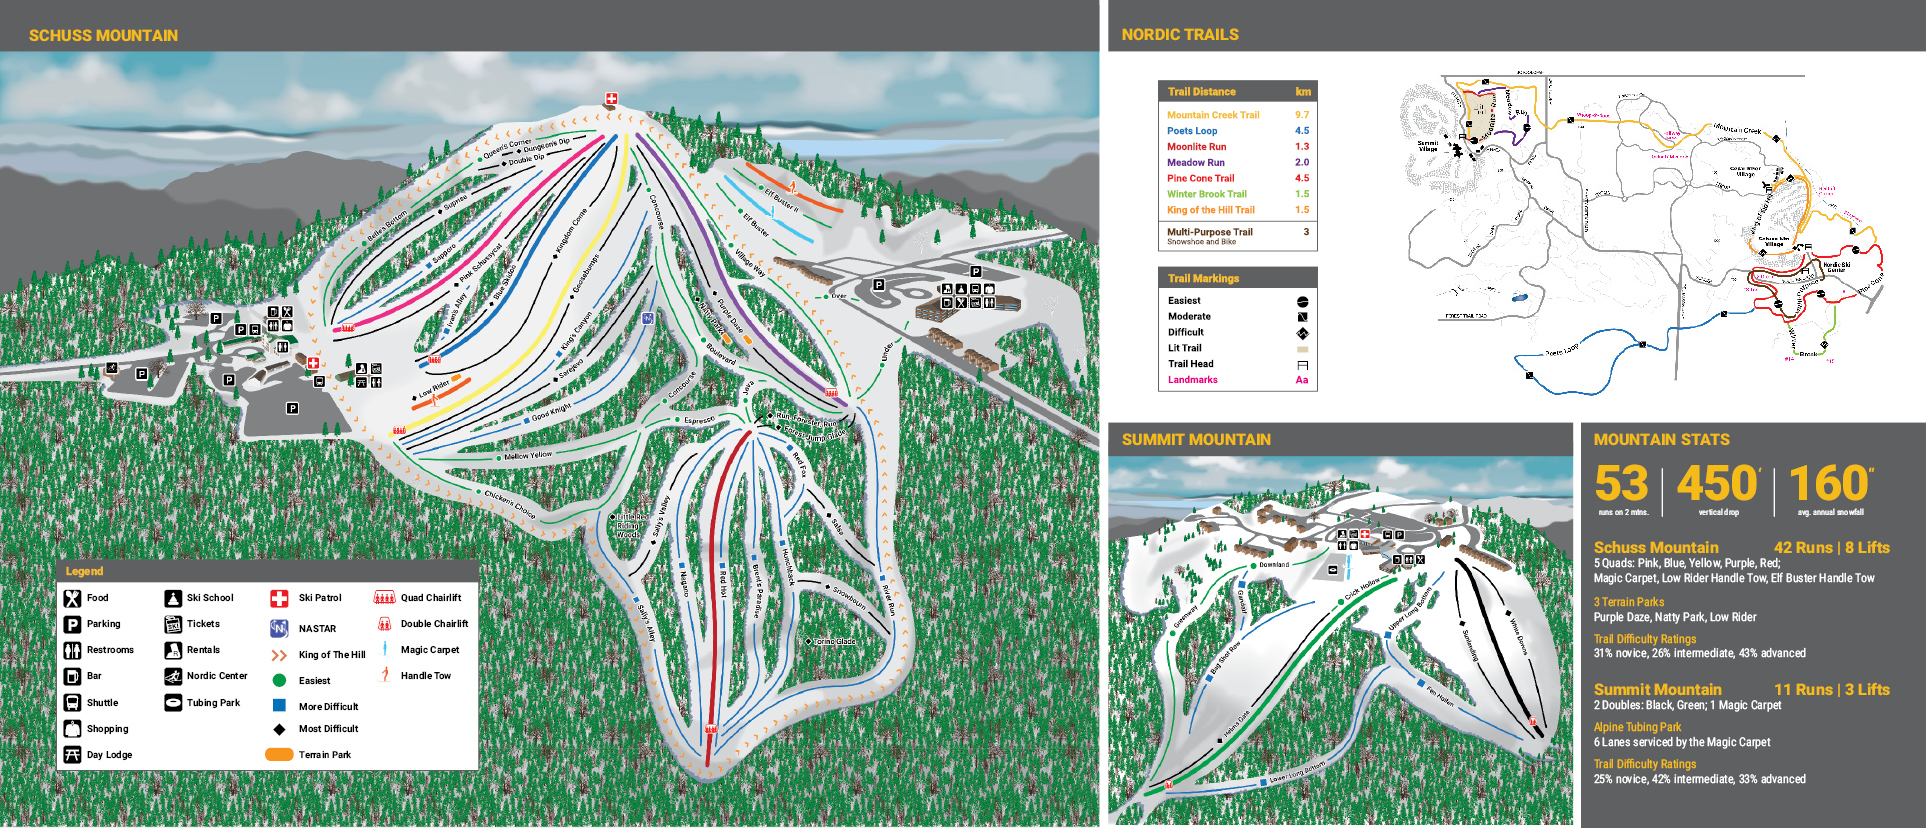 Schuss Mountain At Shanty Creek Trail Map Onthesnow